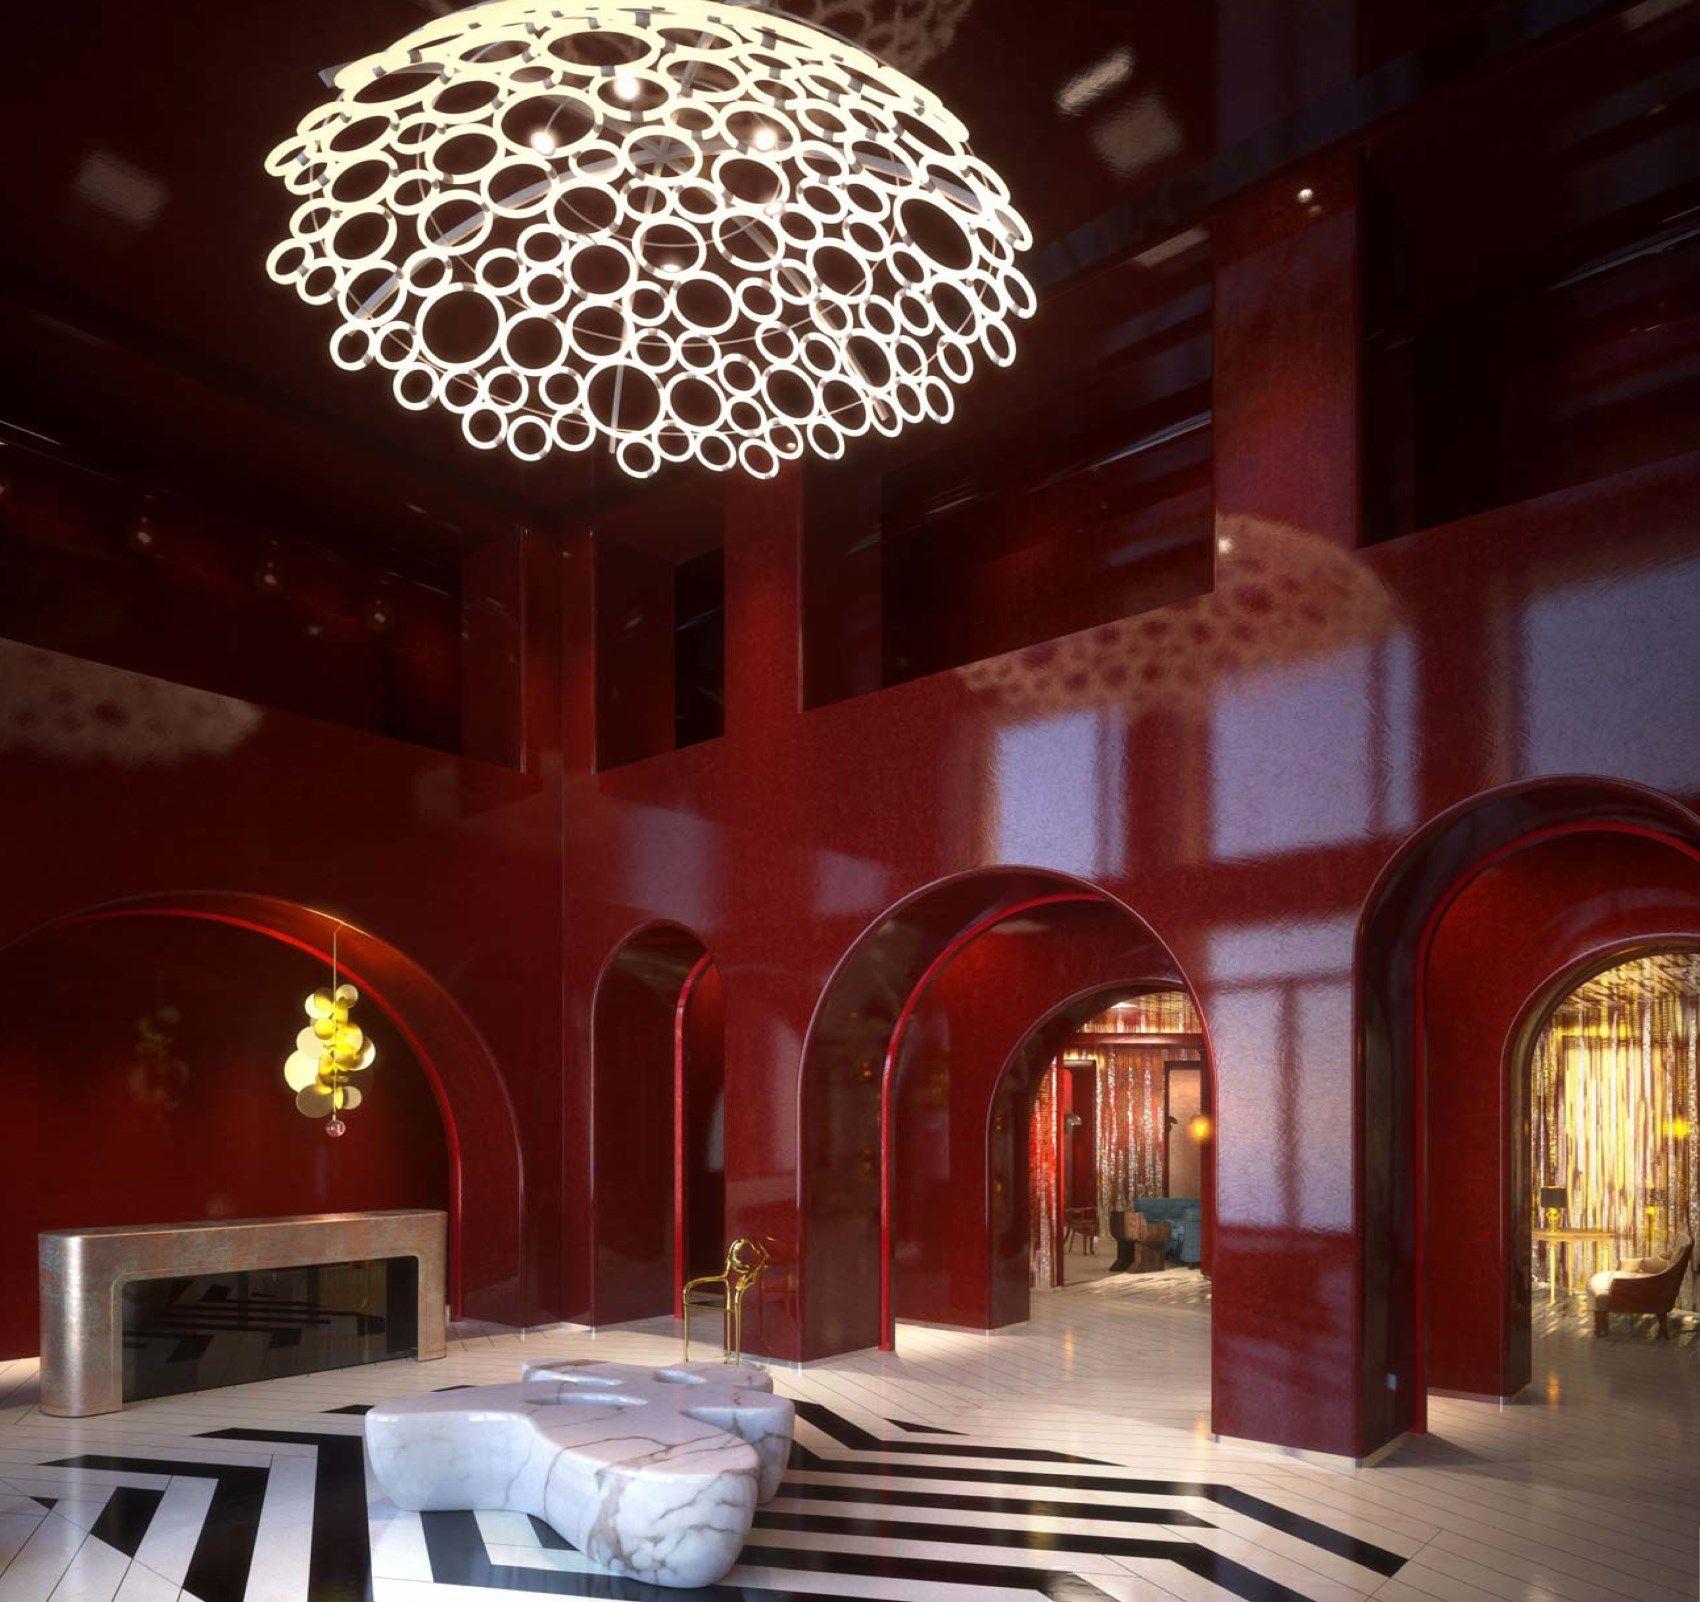 Hotel du louvre lamps lighting pinterest for Hoteles diseno paris